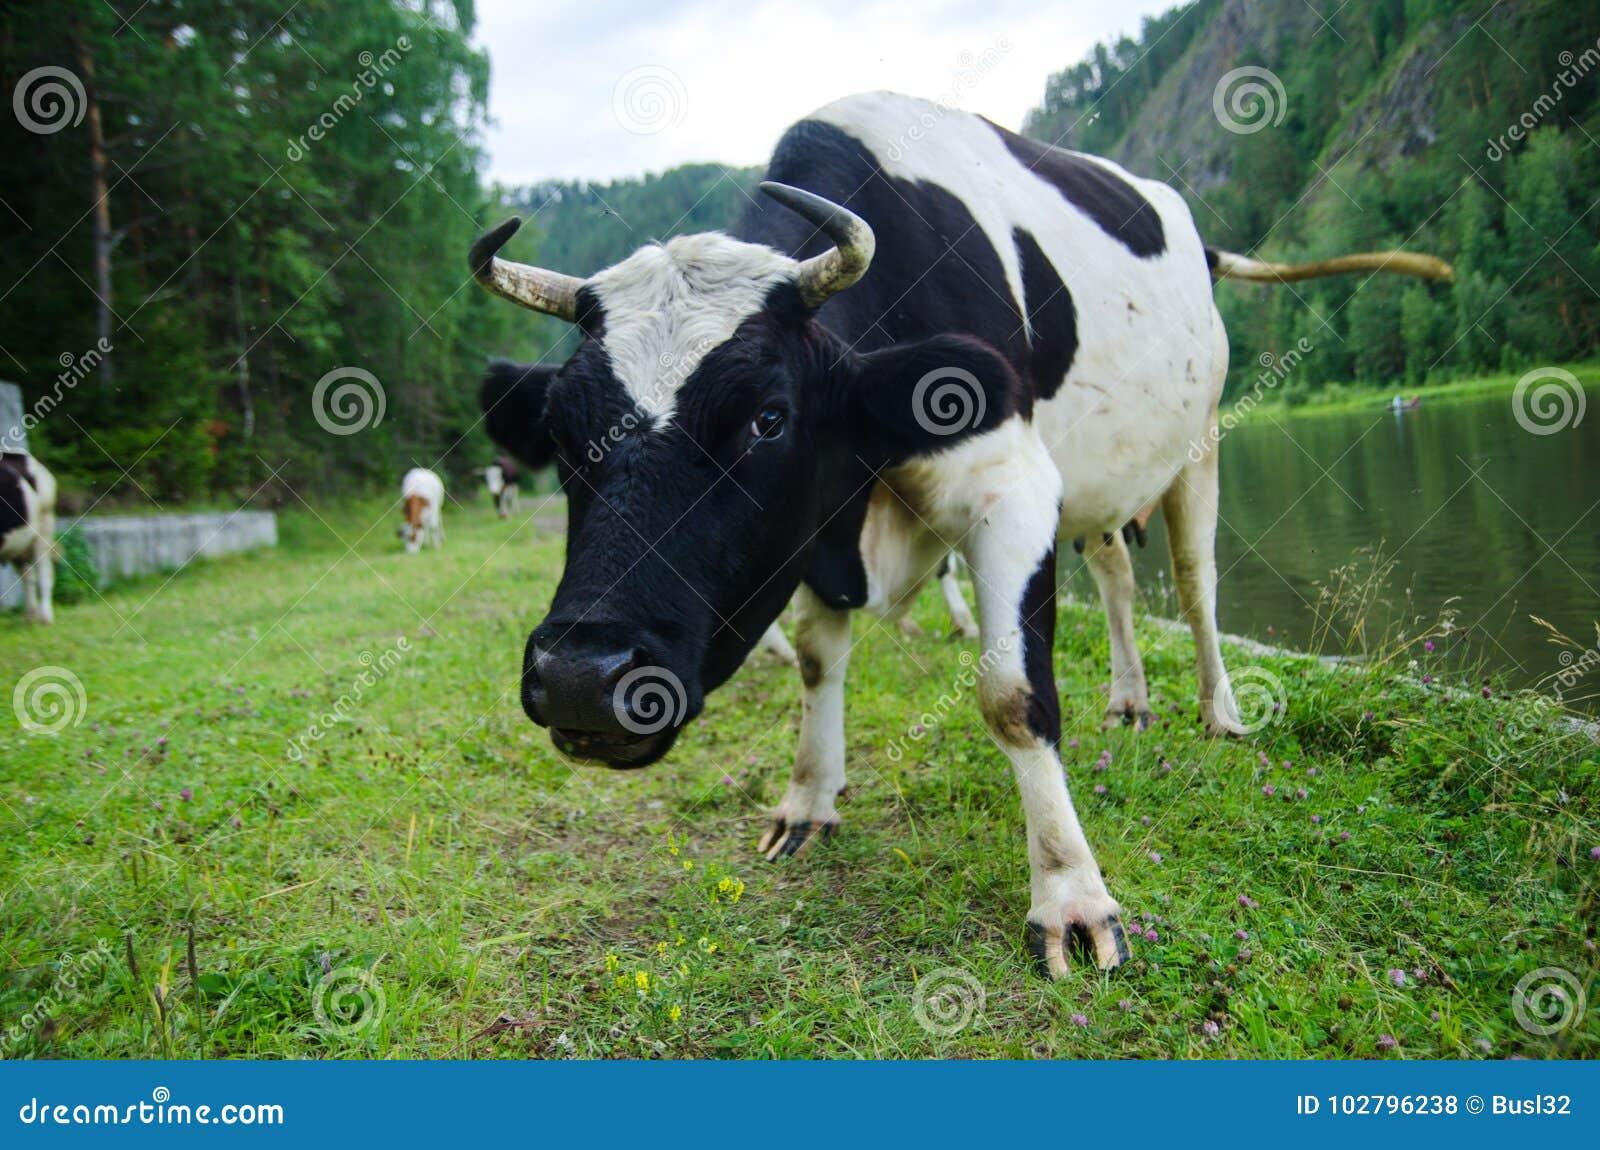 Cow, Agriculture, Pasture, Animal, Ranch, River, Landscape, Village